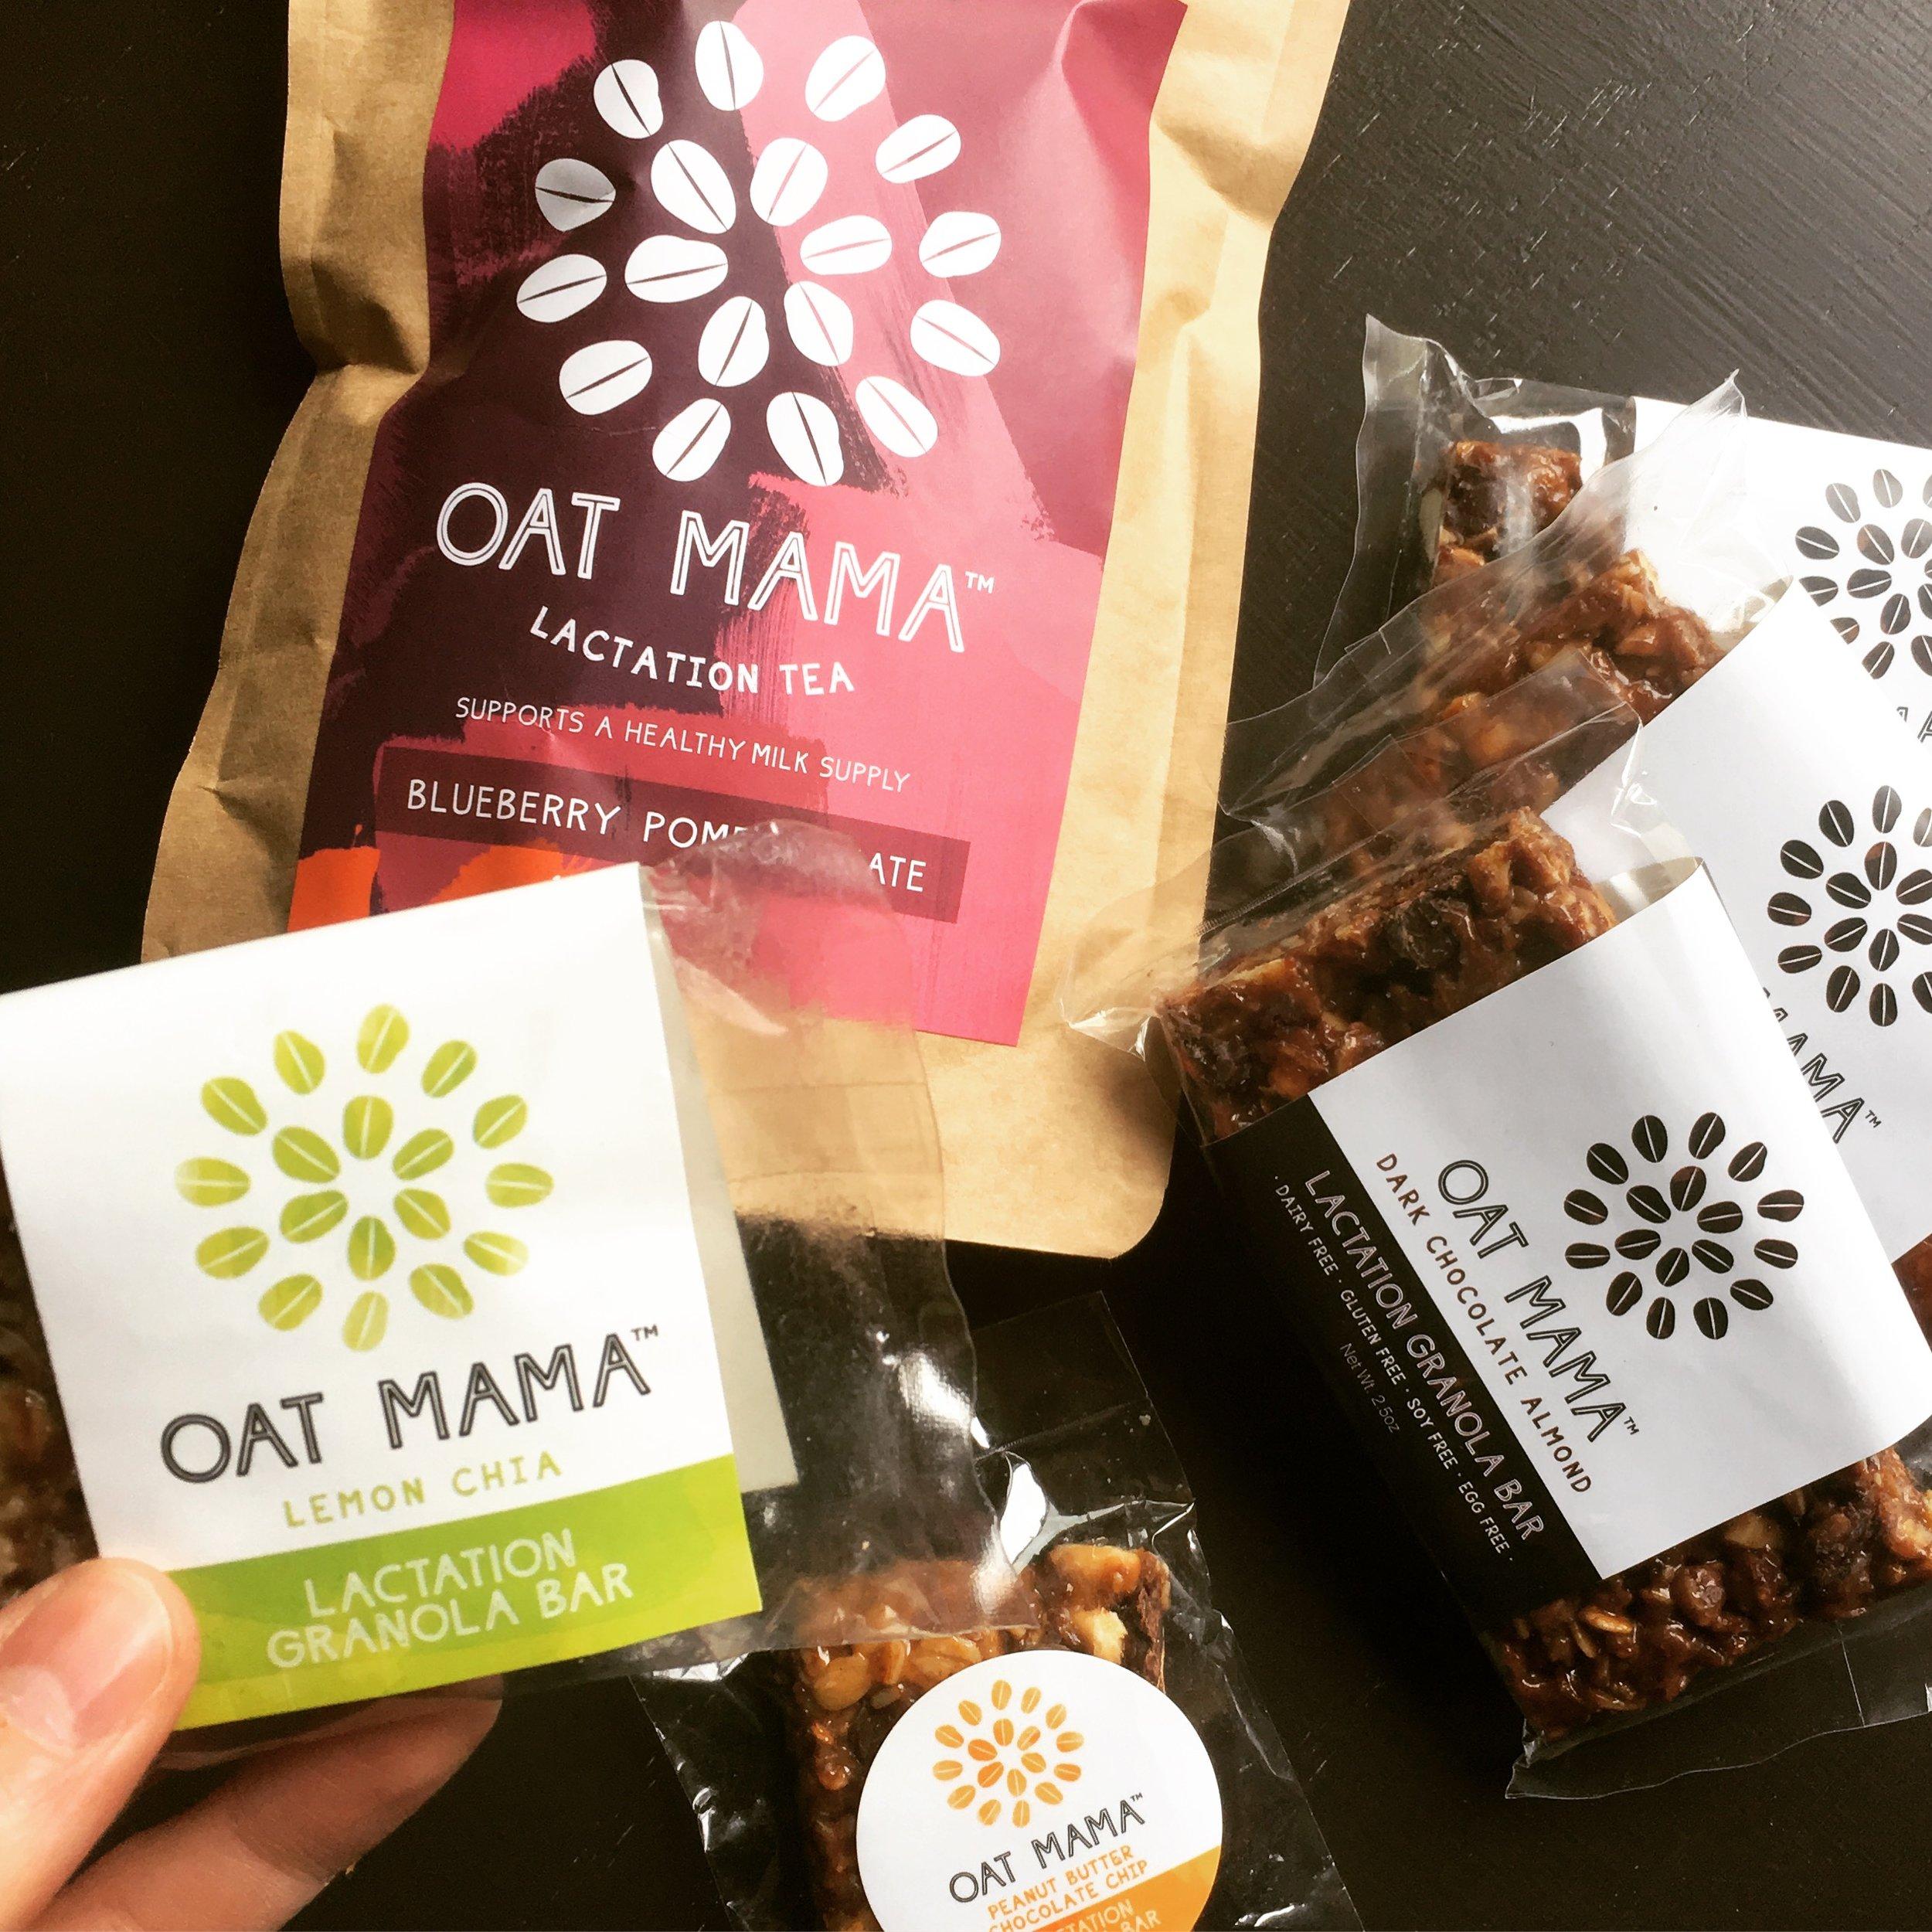 Oat Mama Lactation Granola Bars - From $30 at OatMama.com